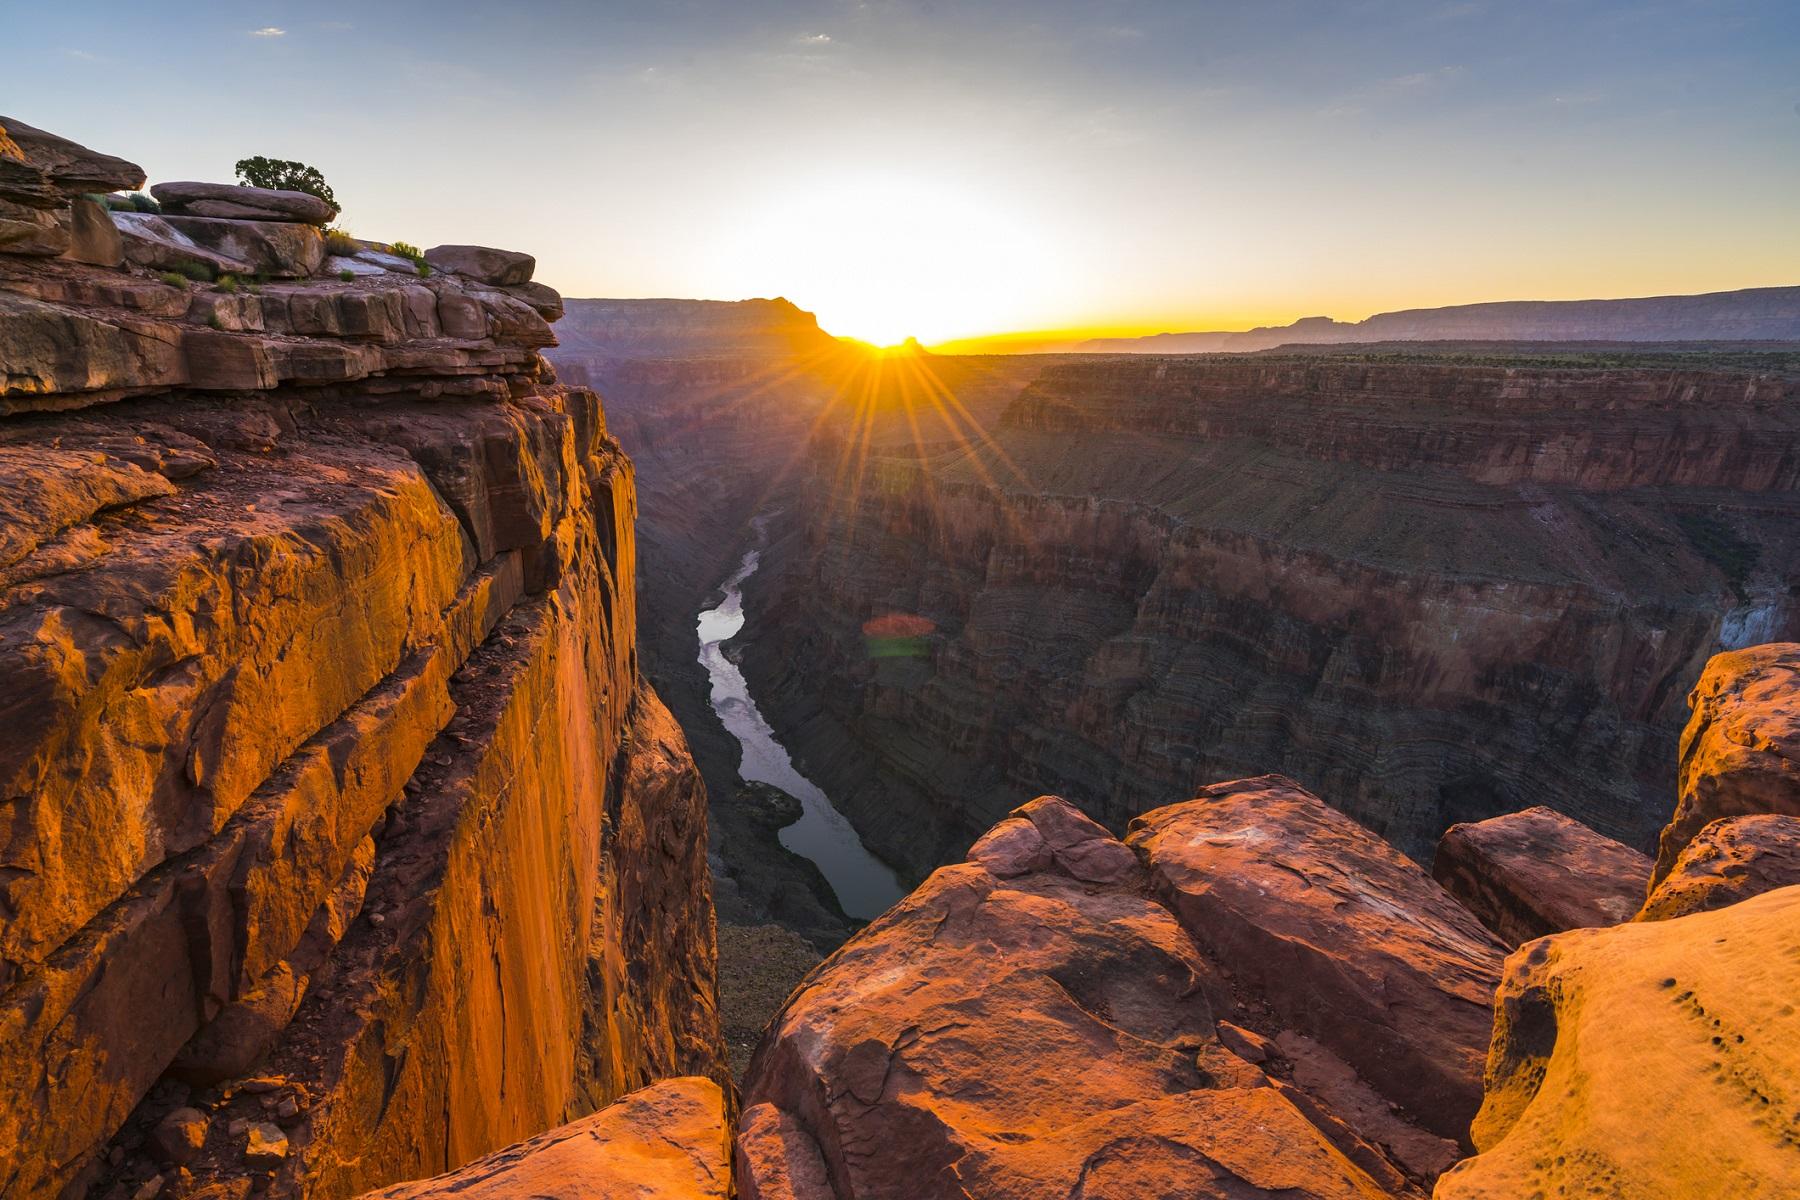 scenic view of Toroweap overlook at sunrise  in north rim, grand canyon national park,Arizona,usa.